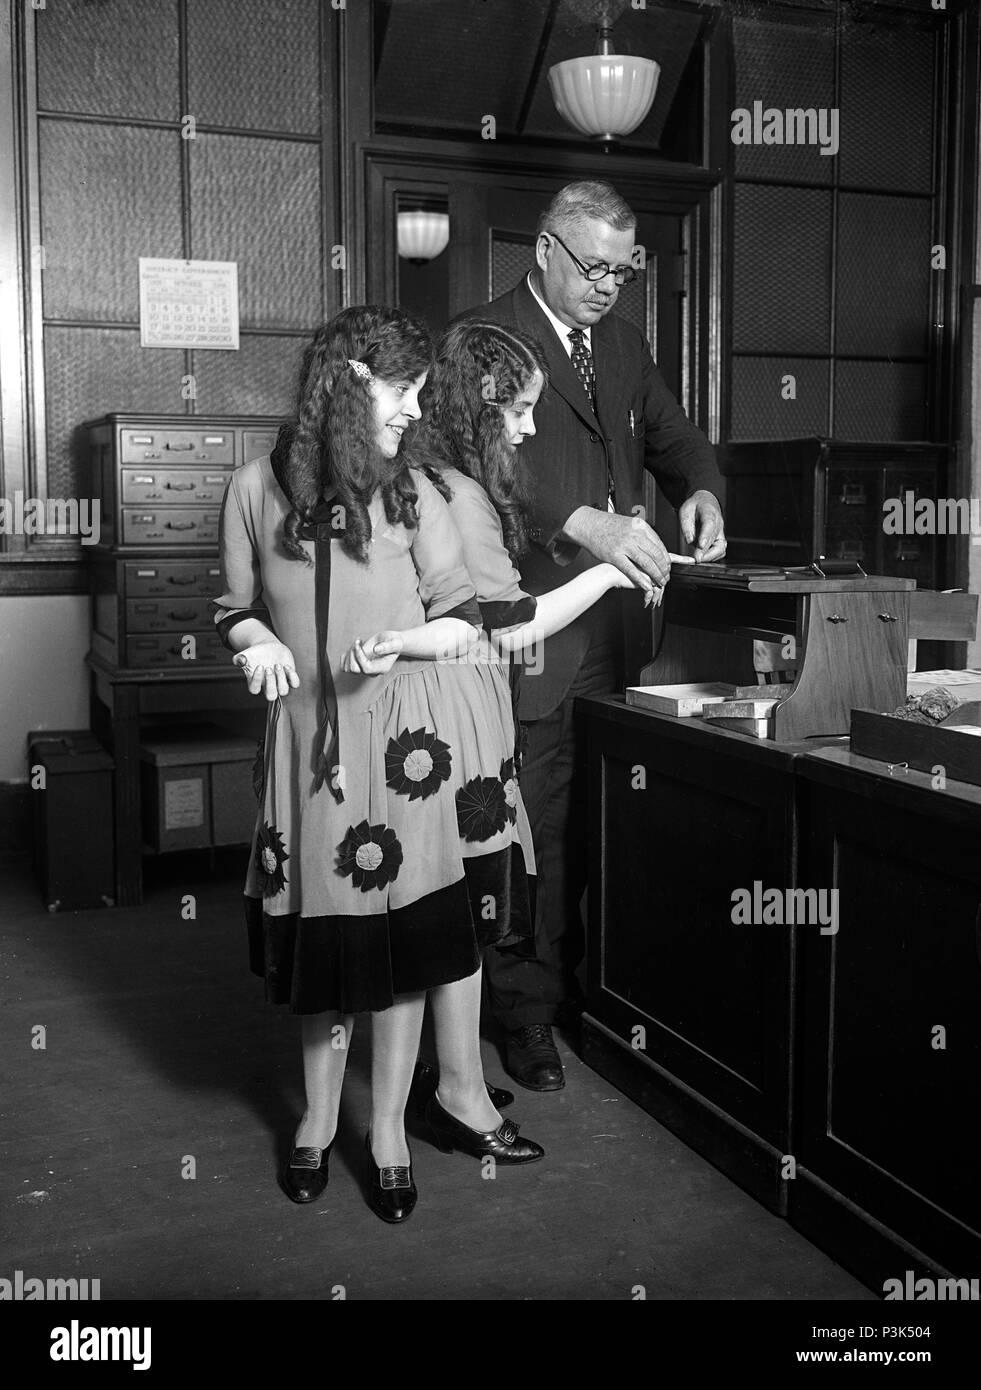 Daisy and Violet Hilton get fingerprinted. Fred Sandberg, District police fingerprint expert, tells Daisy and Violet Hilton, 'Siamese Twins,' apart by their fingerprints - Stock Image